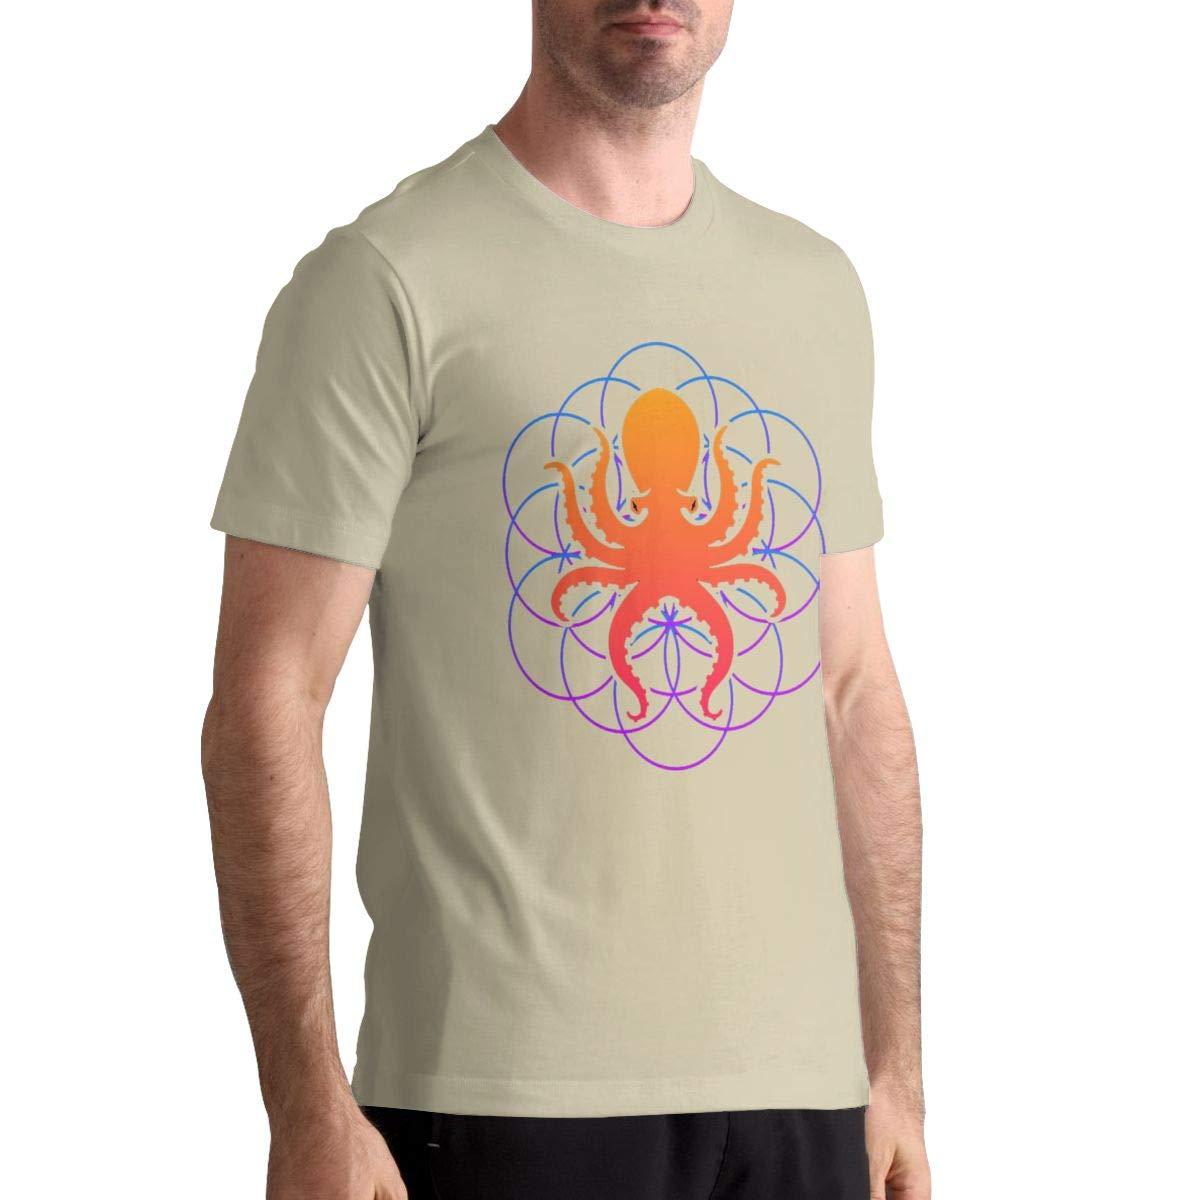 DANIELBURTON Summer Psychedelic Sacred Geometry Octopus Man Natural T-Shirt Top Tees Short Sleeve Shirts